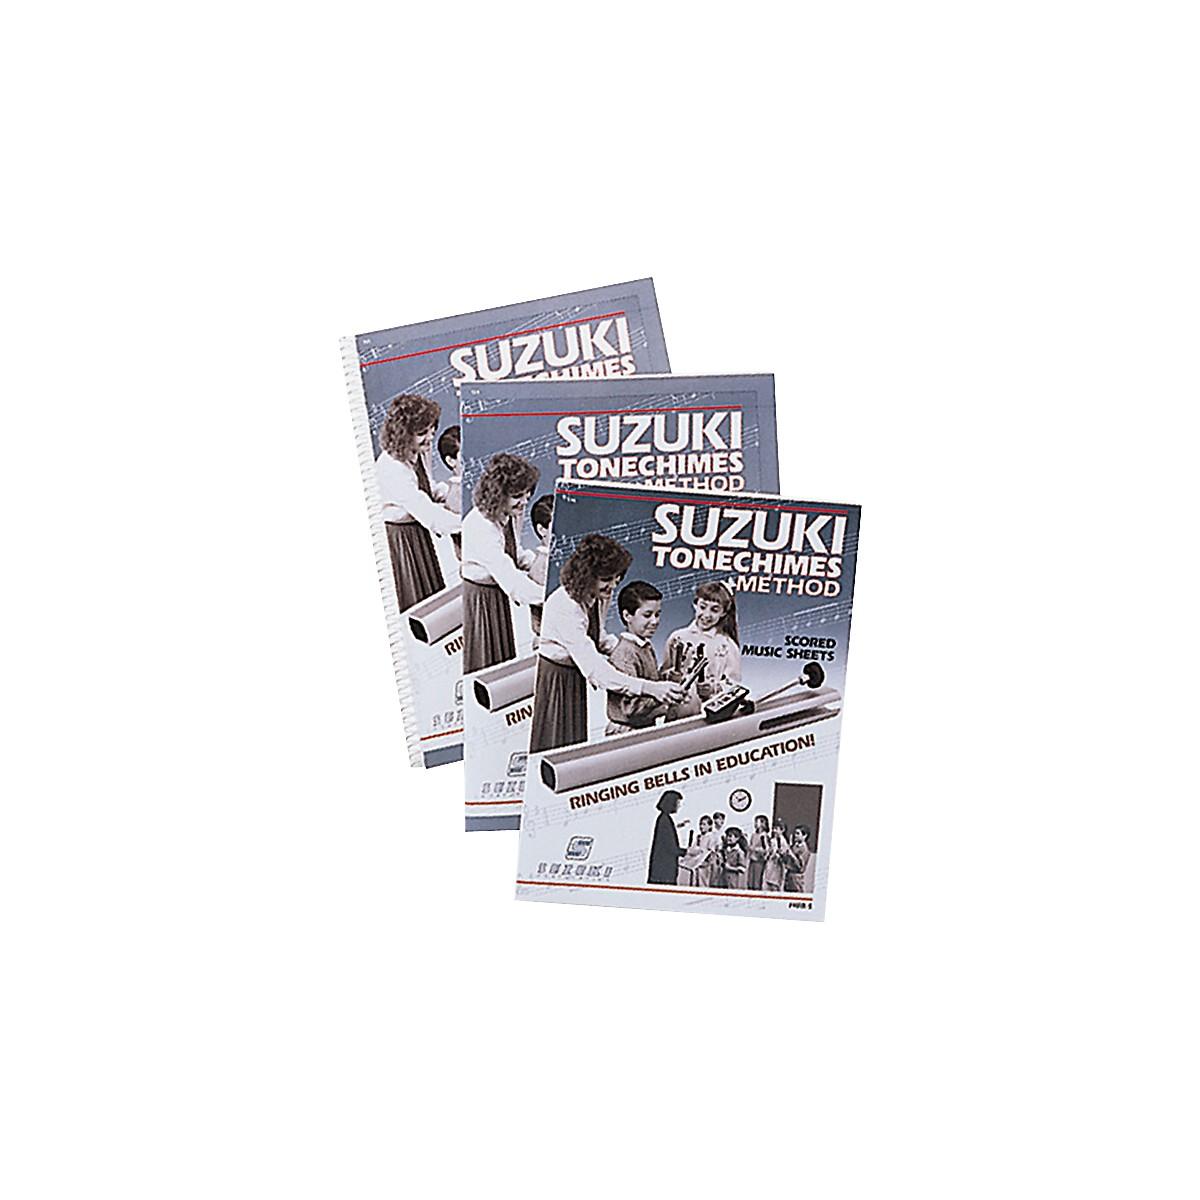 Suzuki Tone Chimes Volume 2 Method/Scored Music Sheets